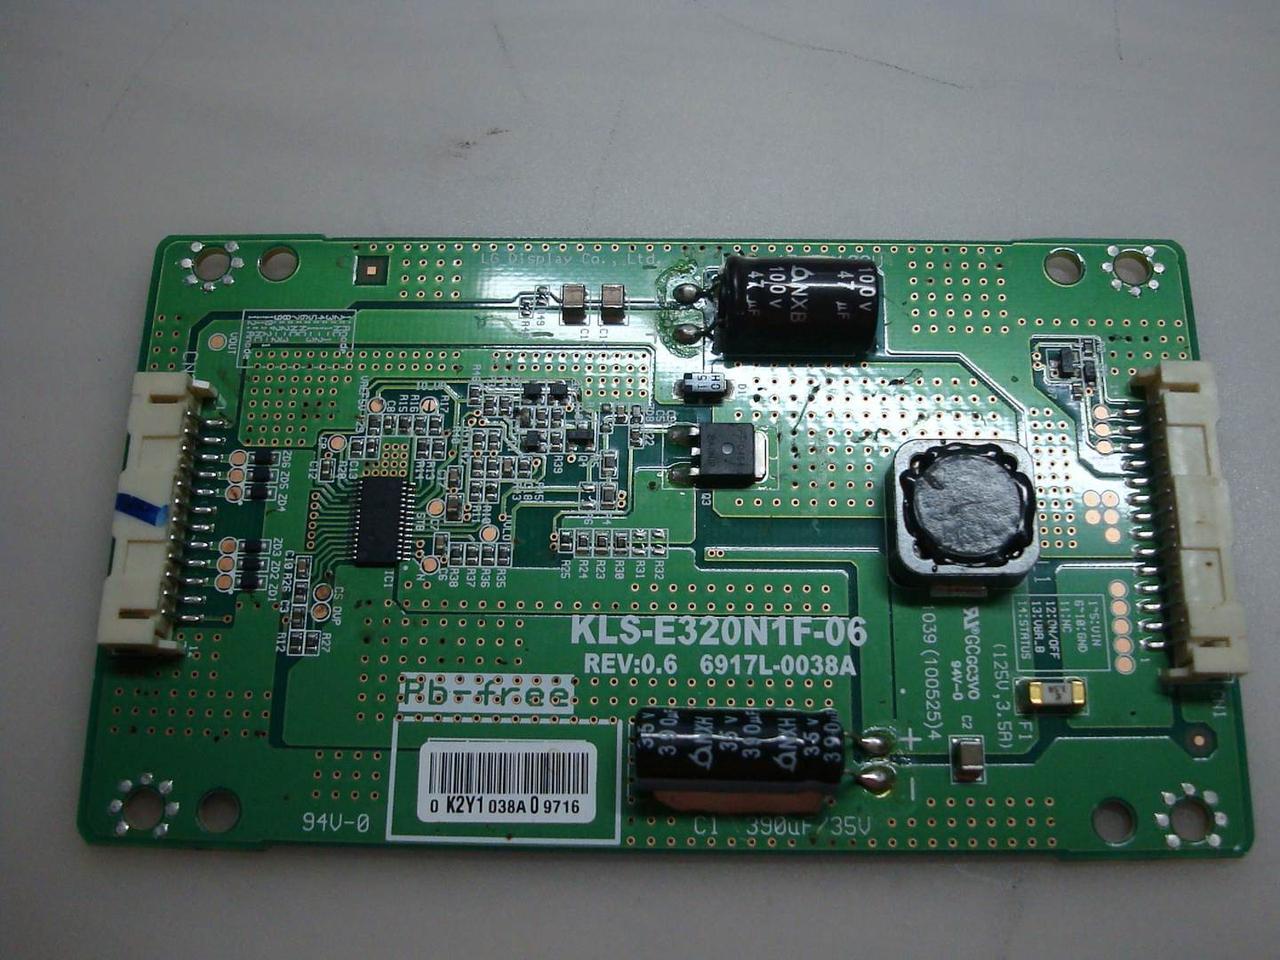 "Запчасти к телевизору 32"" LG 32LE3300 (LGP3237-10Y, KLS-E320N1F-06, 6917L-0038A)"